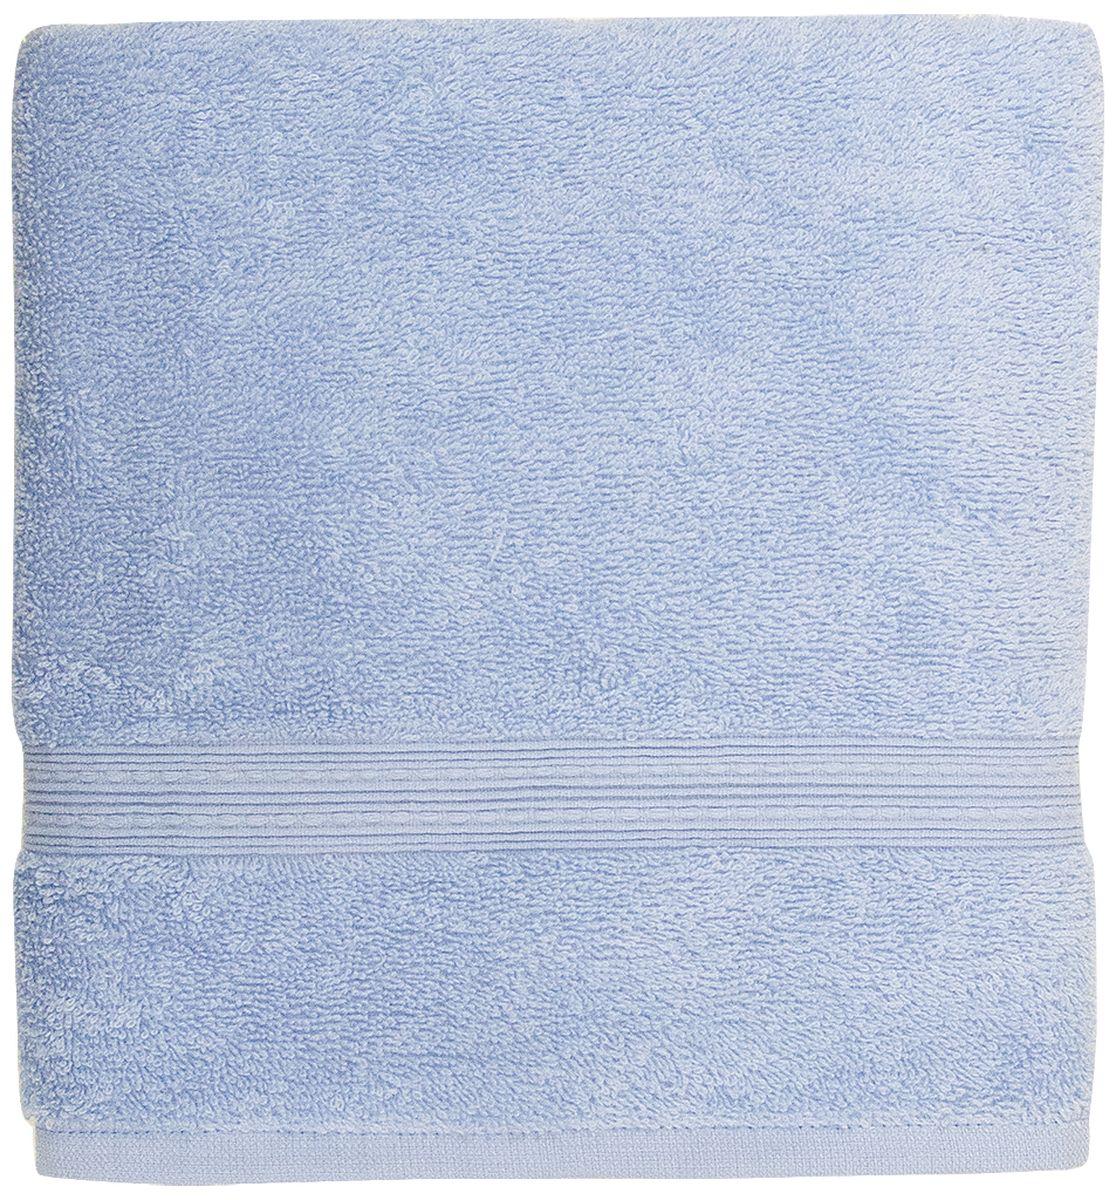 Полотенце банное Bonita Classic, махровое, цвет: азур, 70 х 140 см1011217222Полотенце банное 70*140 Bonita Classic, махровое